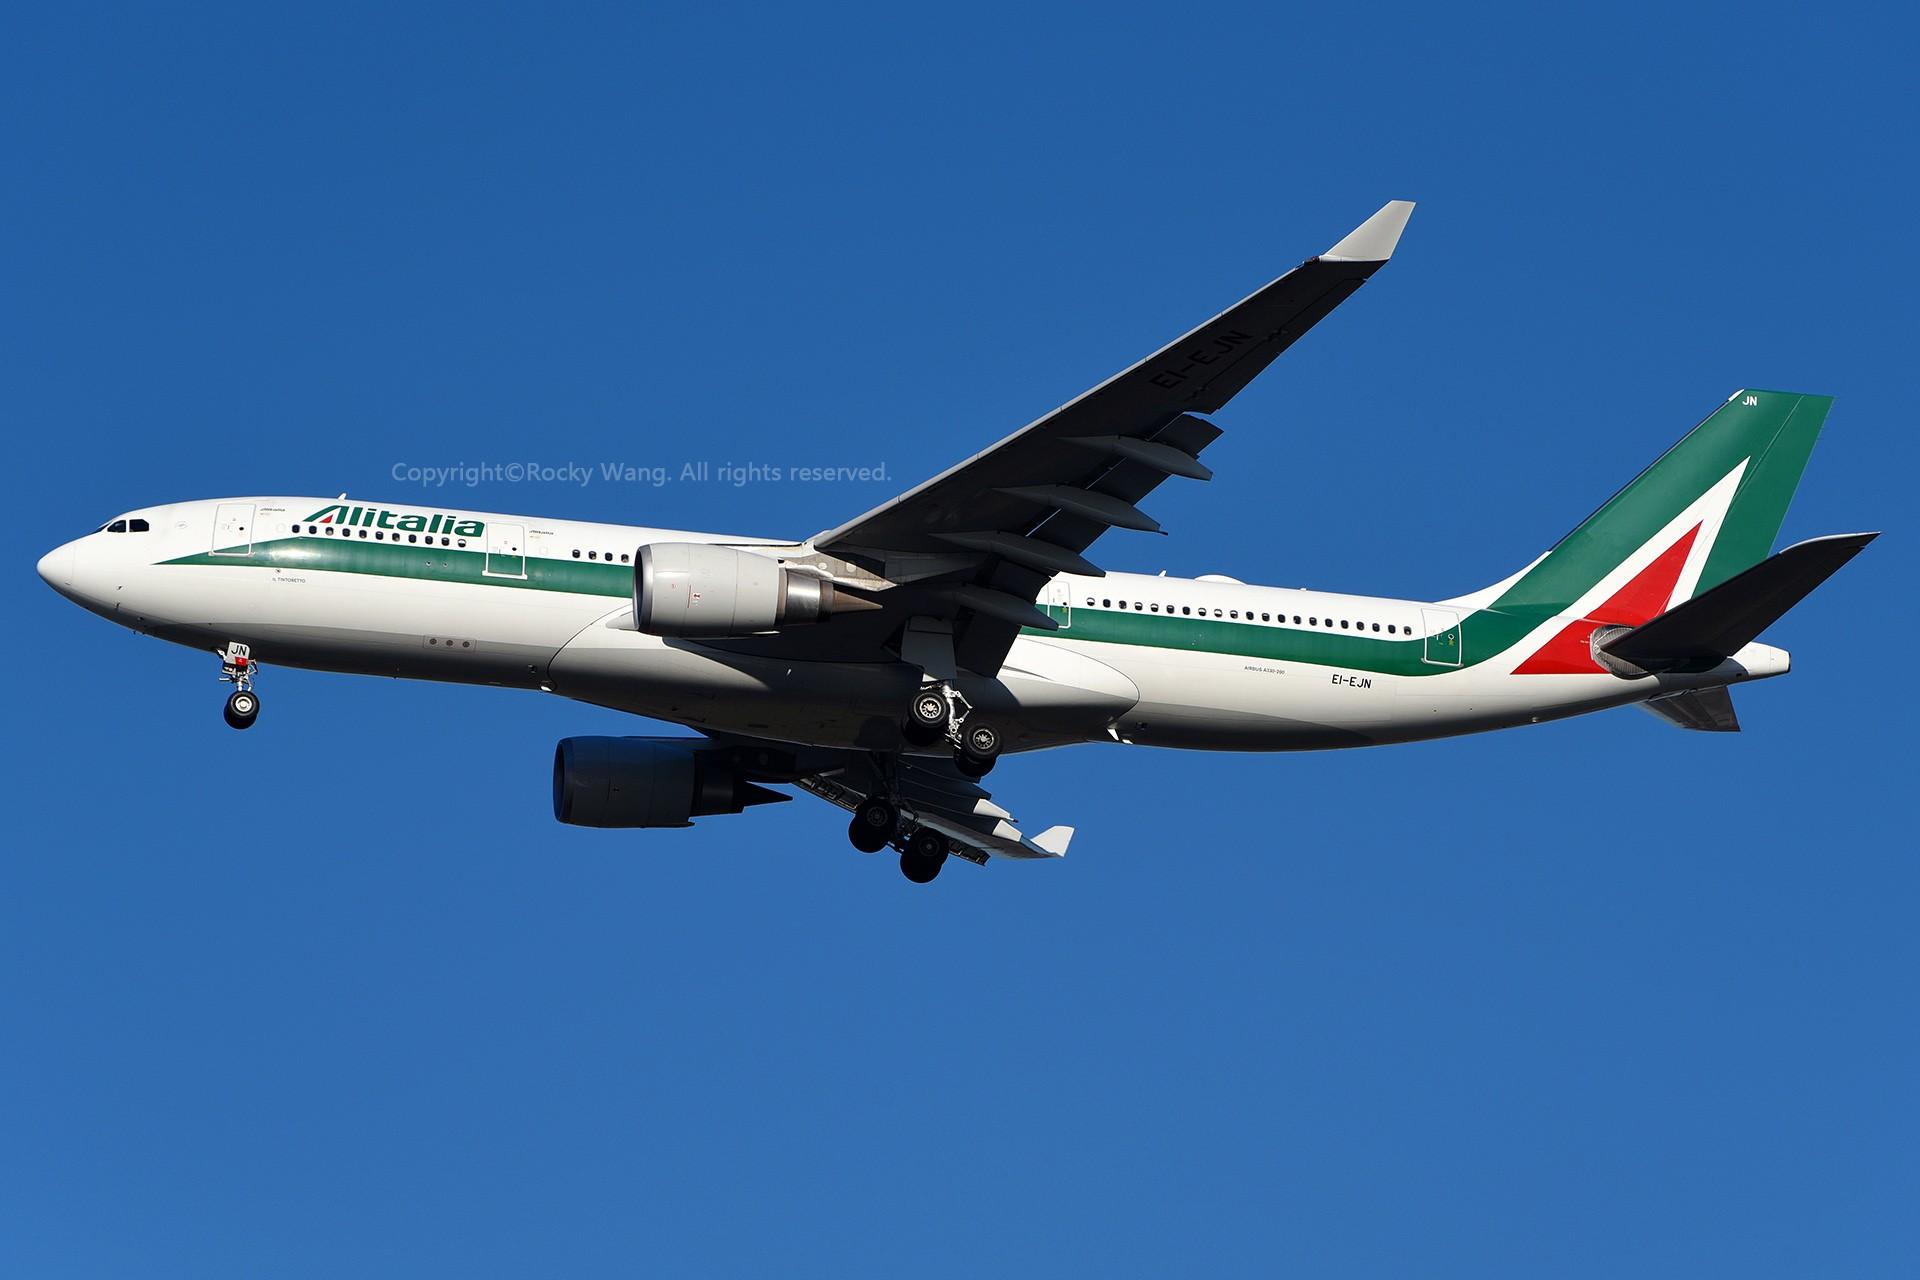 Re:[原创]A330s Around the World AIRBUS A330-202 EI-EJN 美国纽约约翰·菲茨杰拉德·肯尼迪国际机场